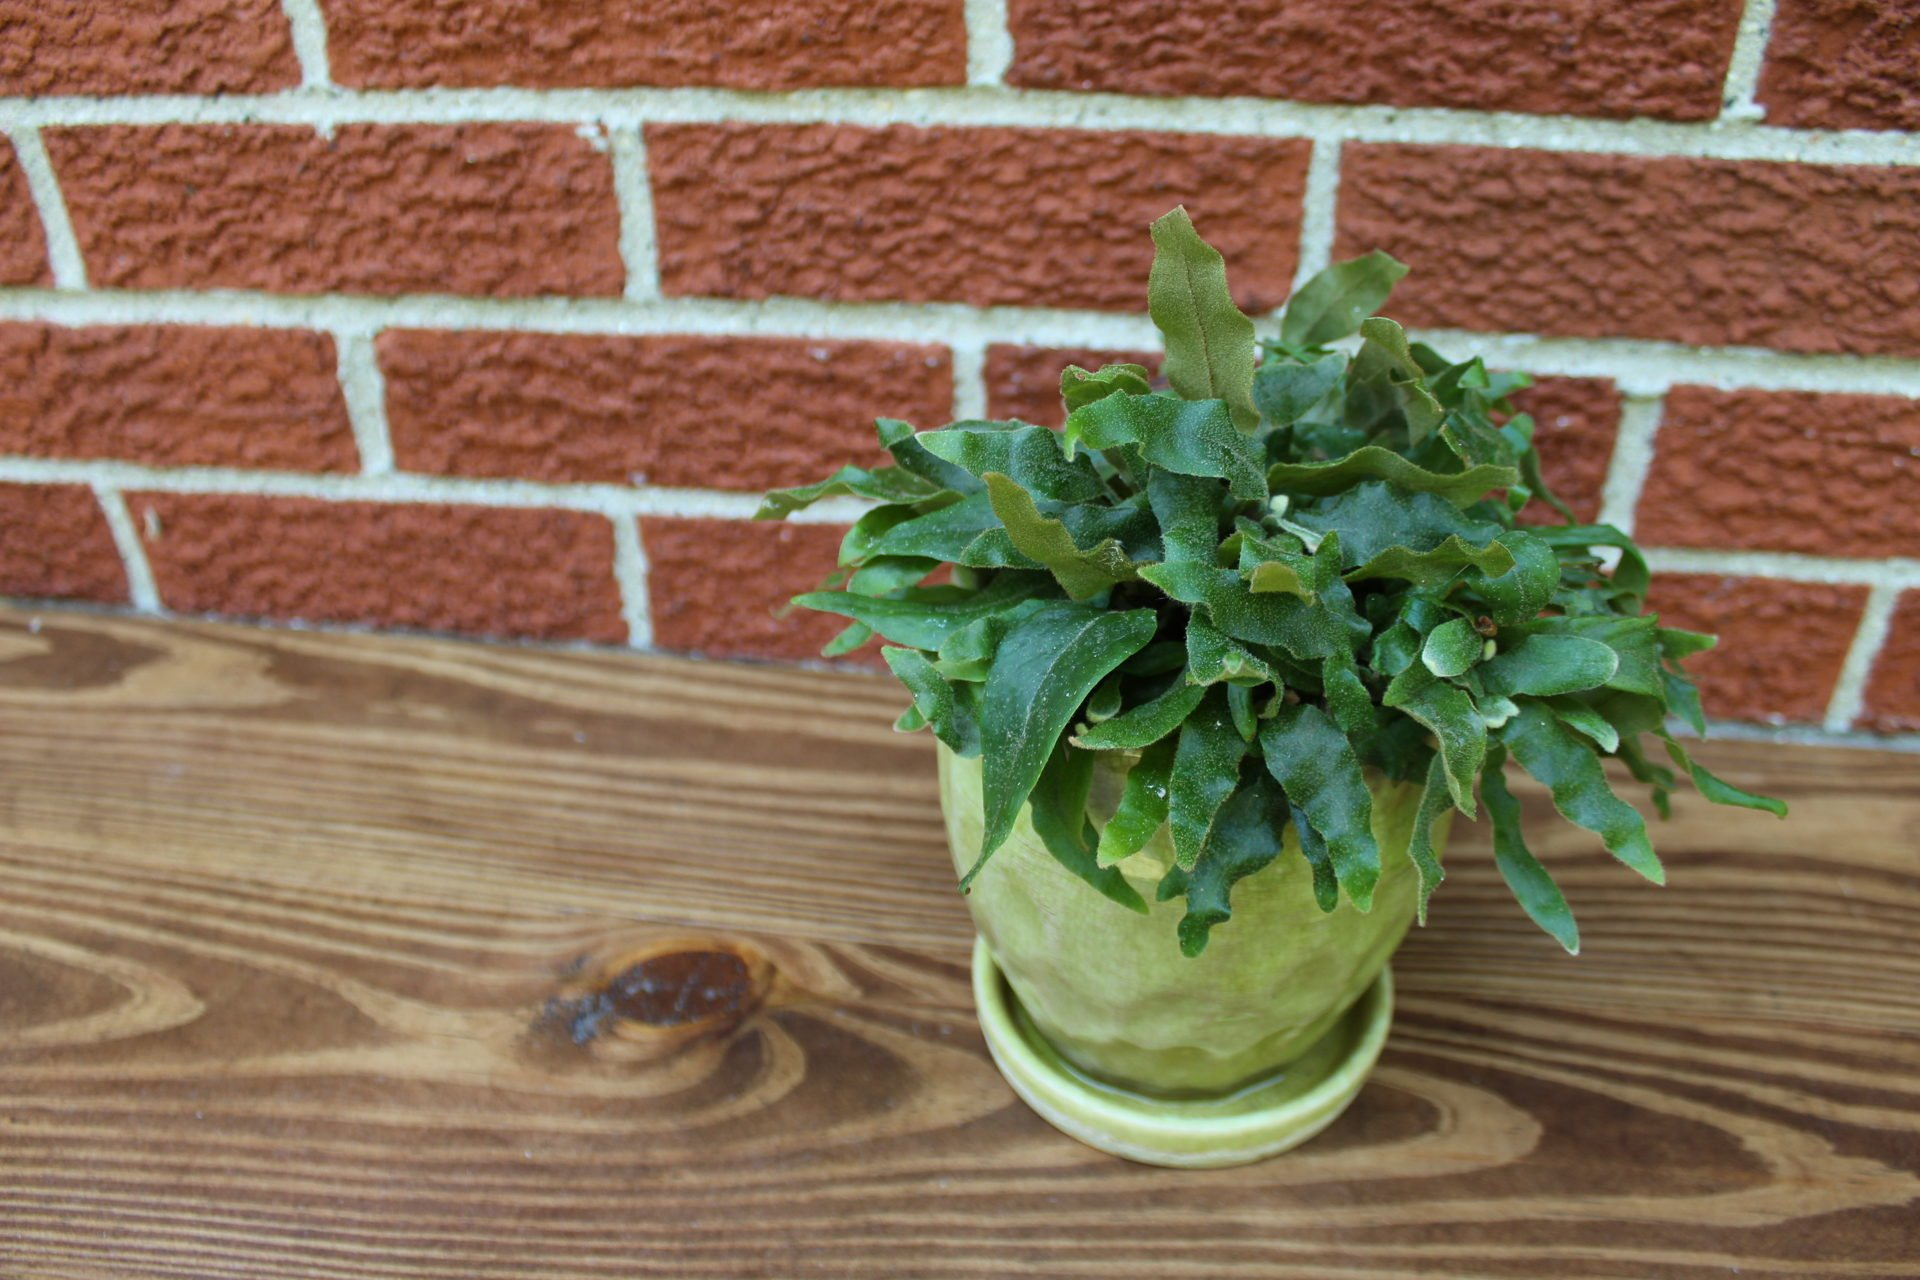 Elaphoglossum fern